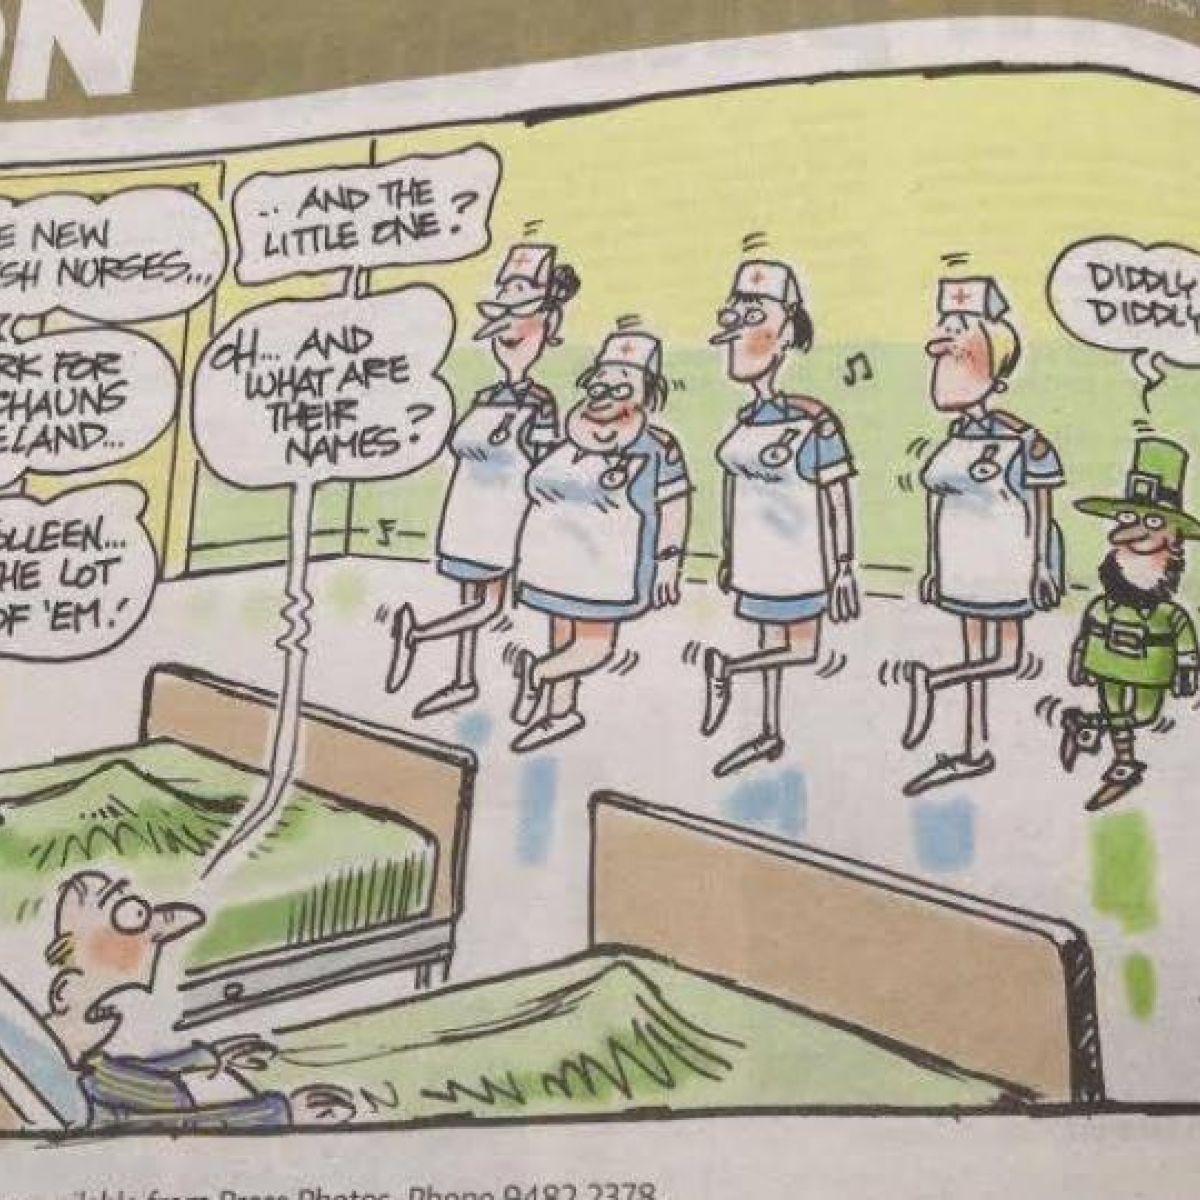 An Irish welcome: how Australia recruits doctors and nurses